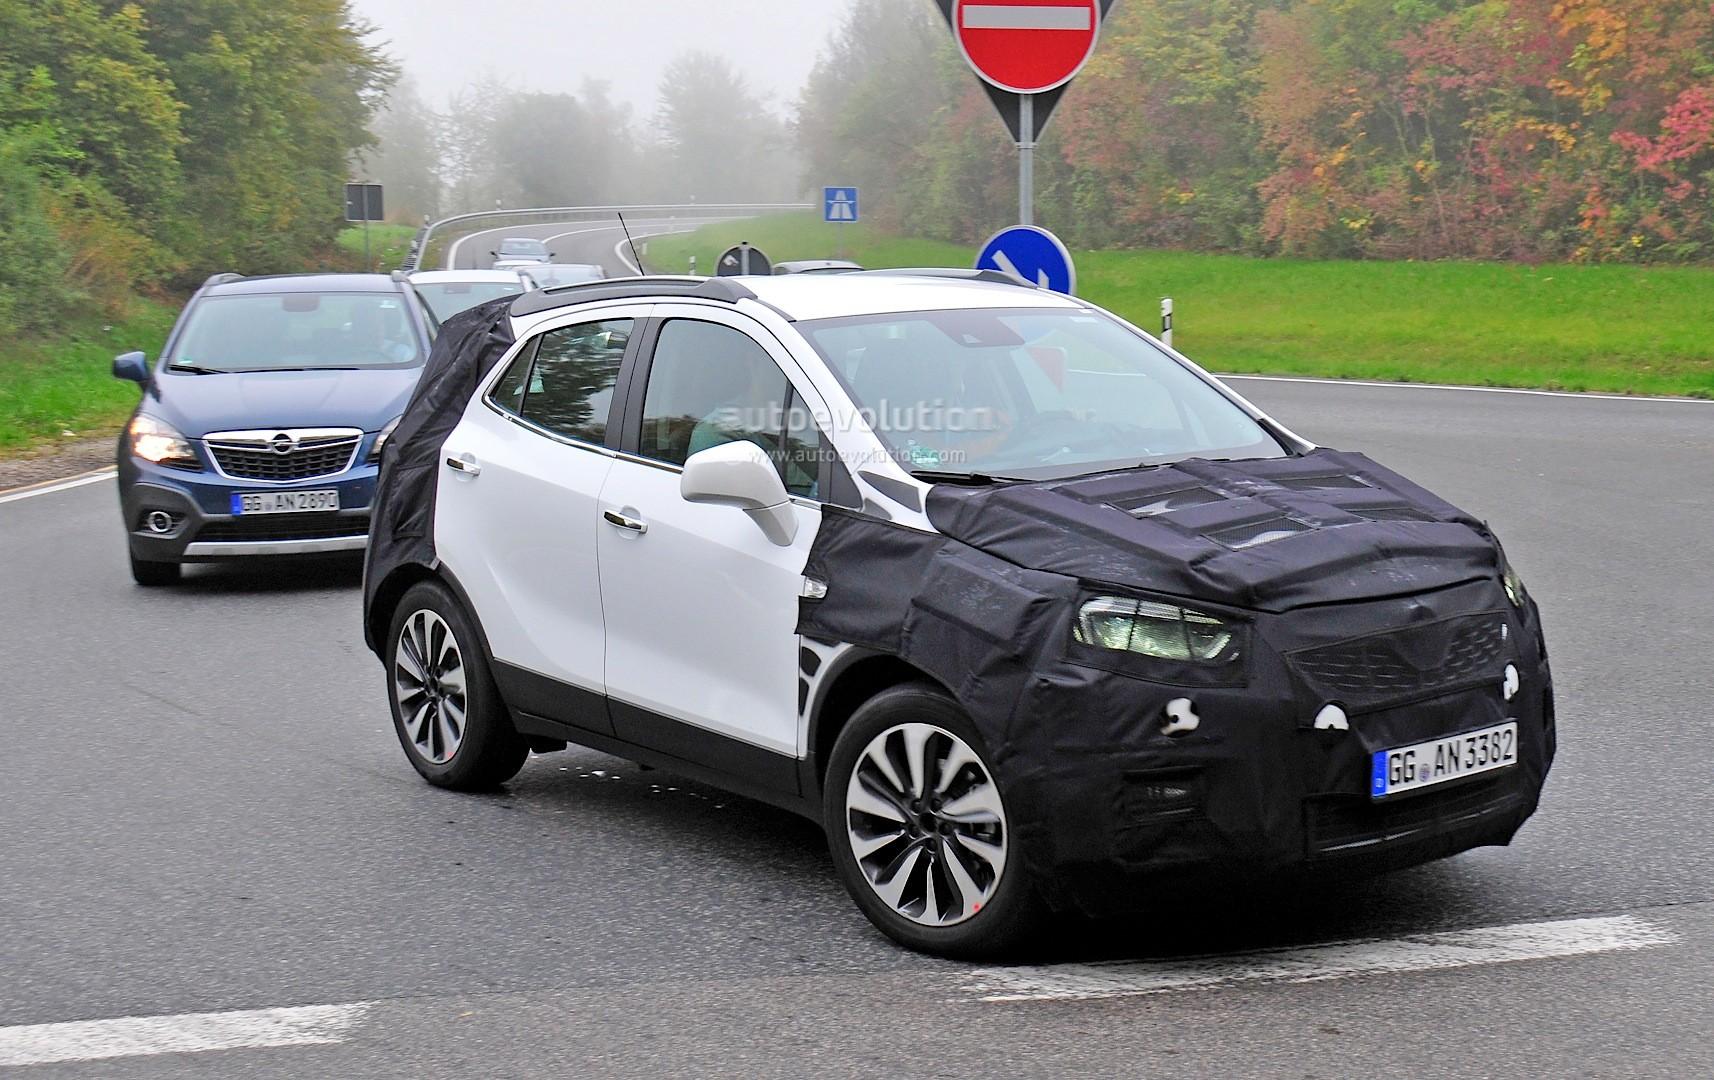 Spyshots: 2016 Opel Mokka Facelift Getting LED Headlights? - autoevolution